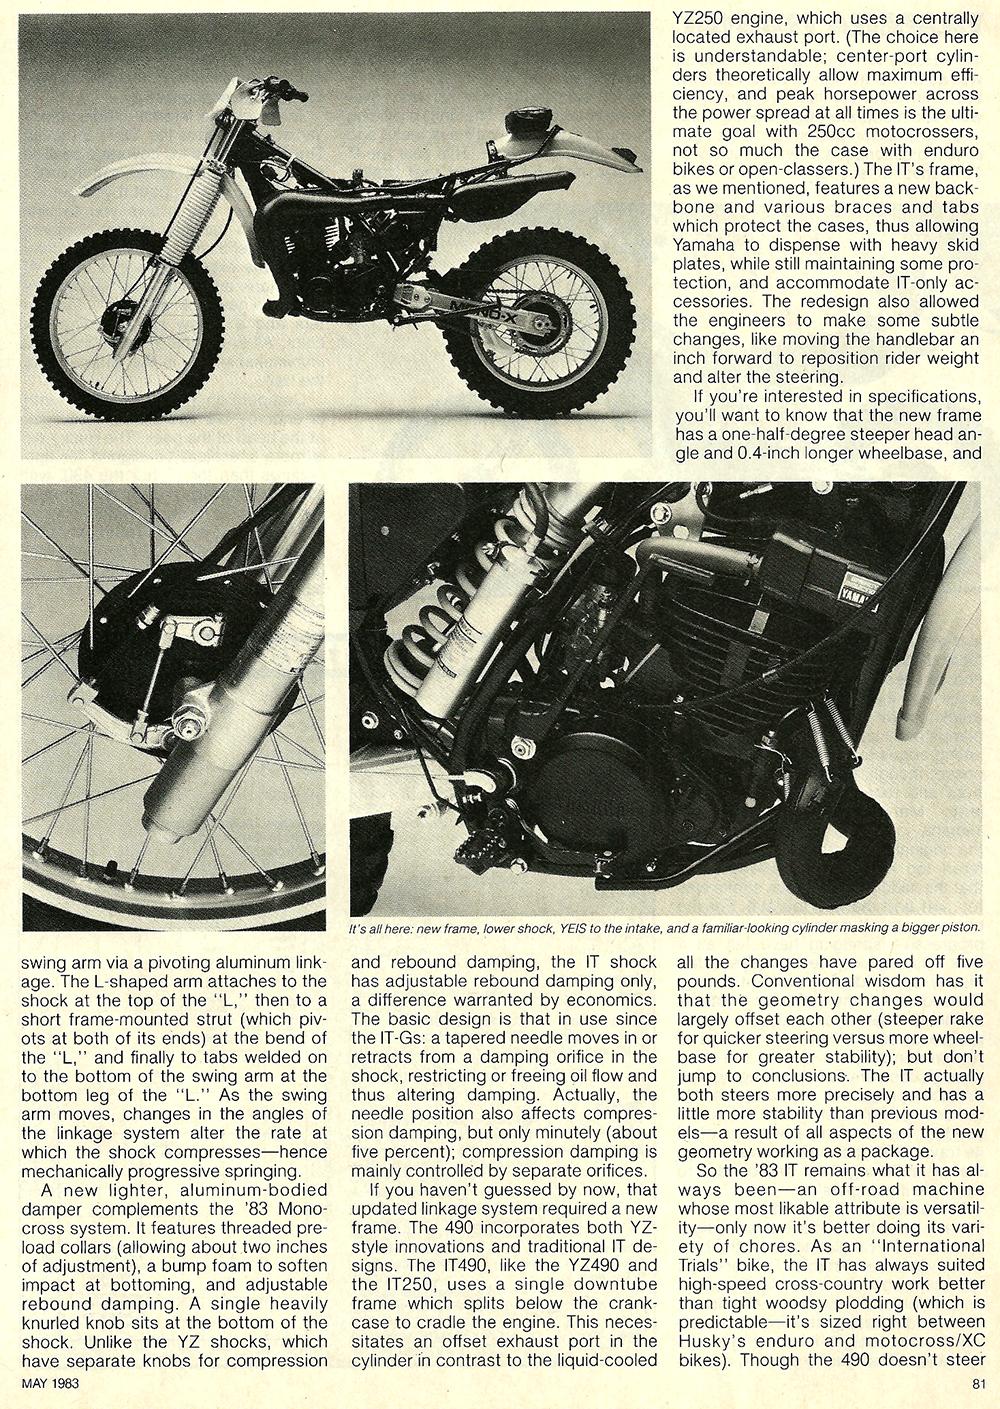 1983 Yamaha IT490K road test 5.jpg